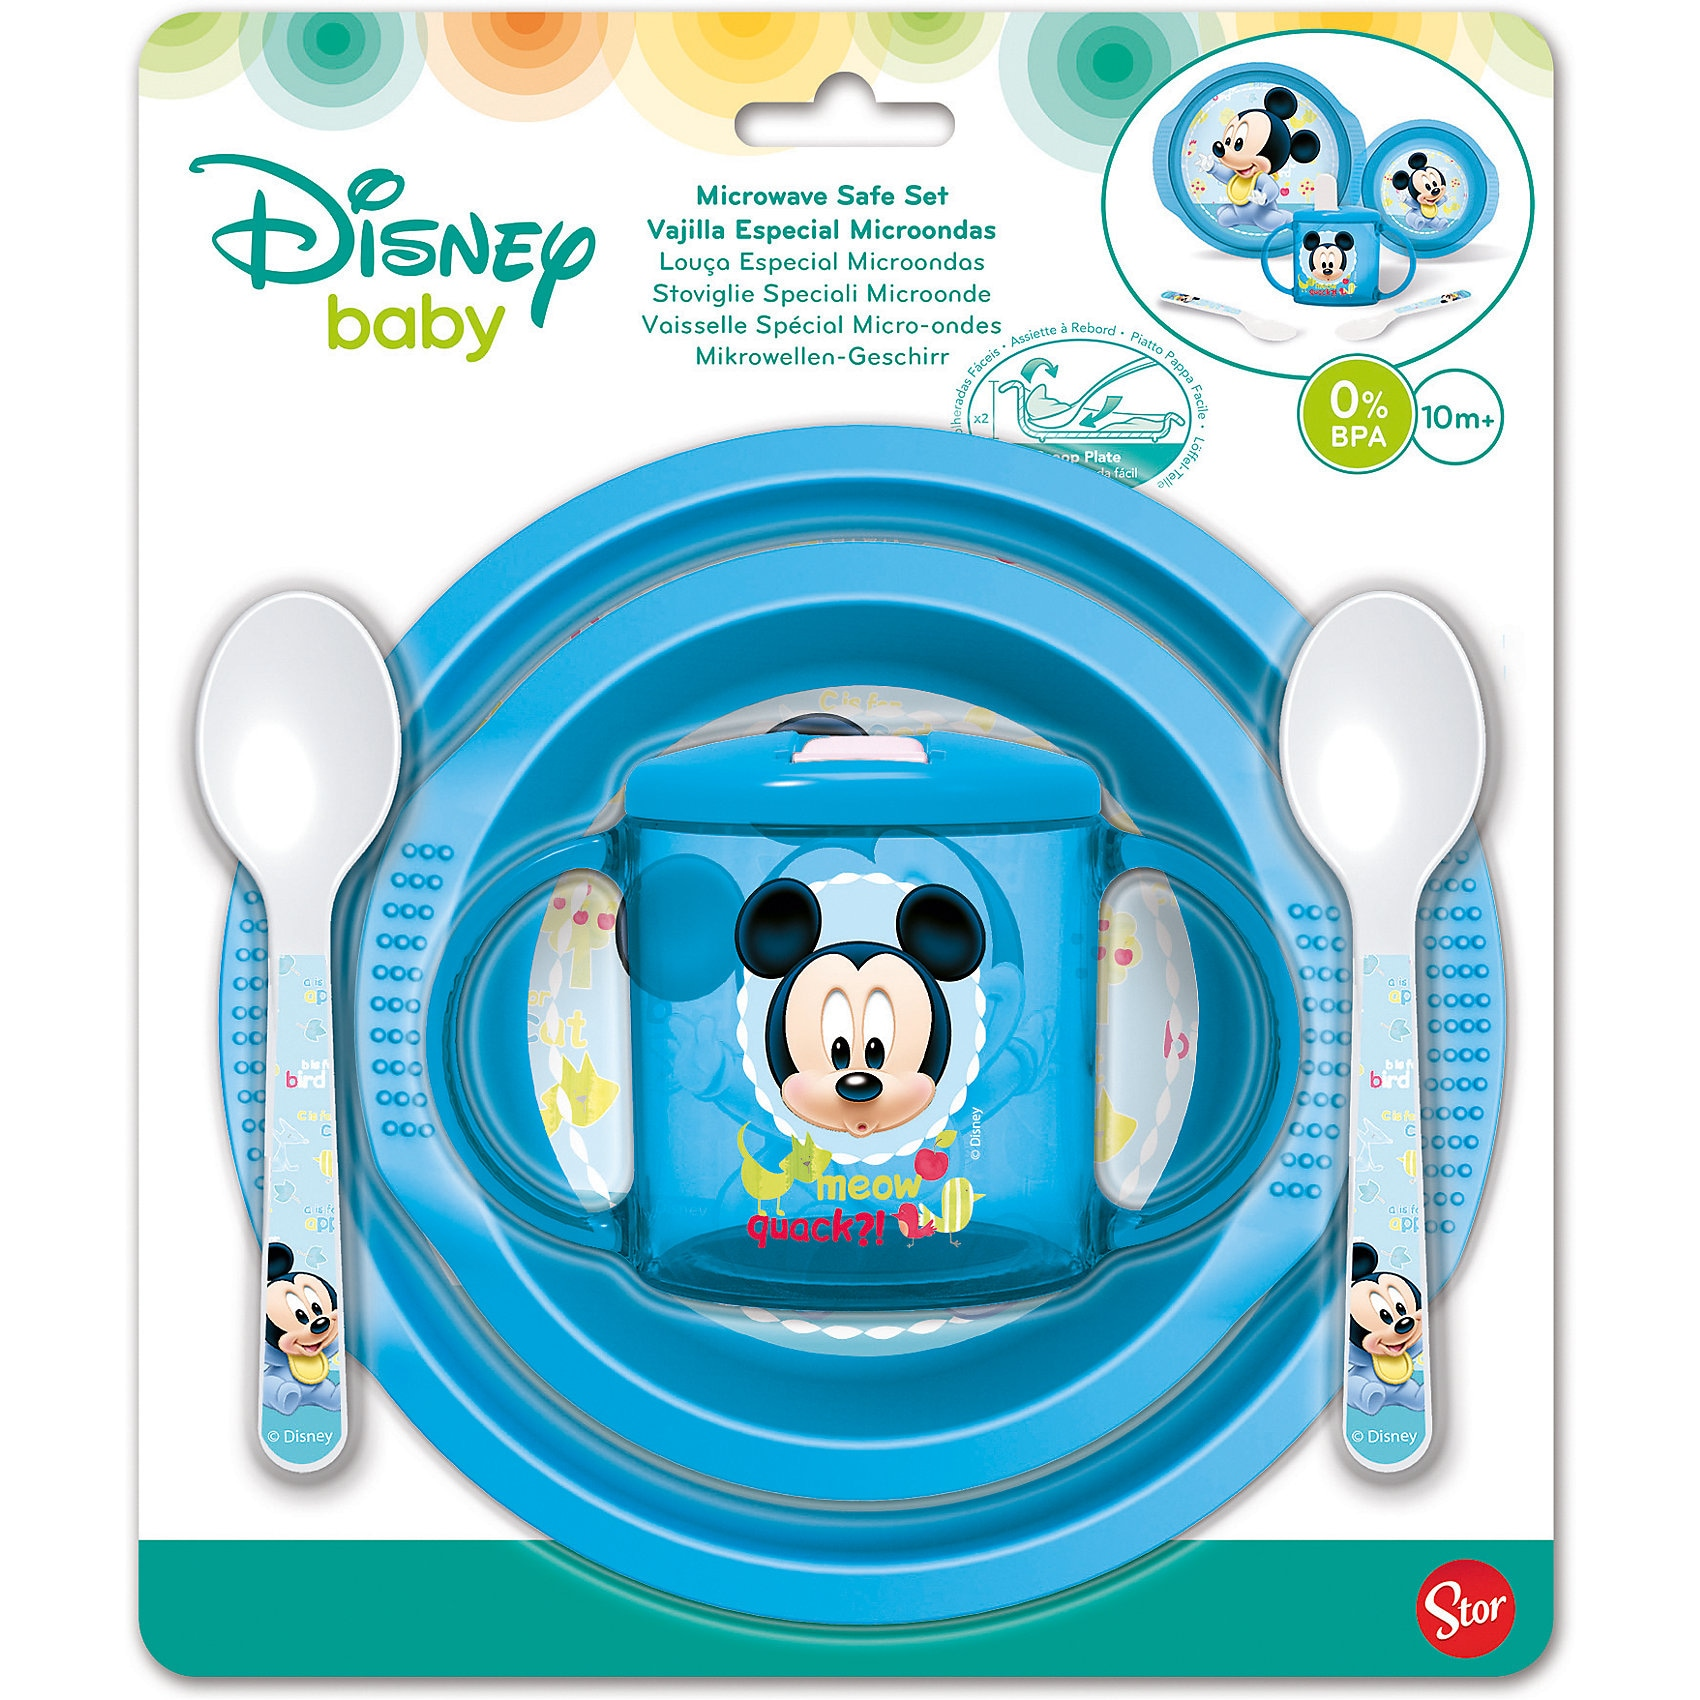 P:OS Baby-Geschirrset Mickey Mouse 5-tlg.